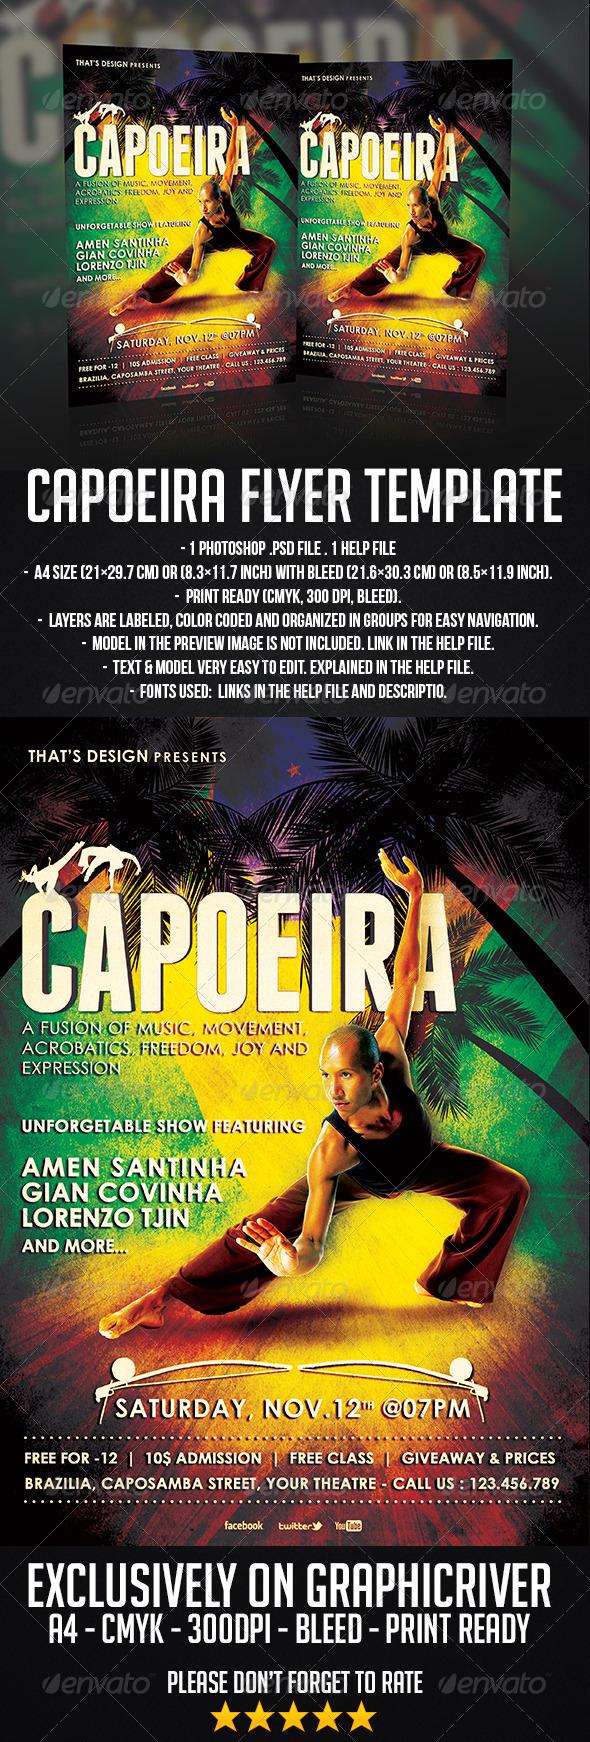 GraphicRiver Capoeira Flyer Template 6677681